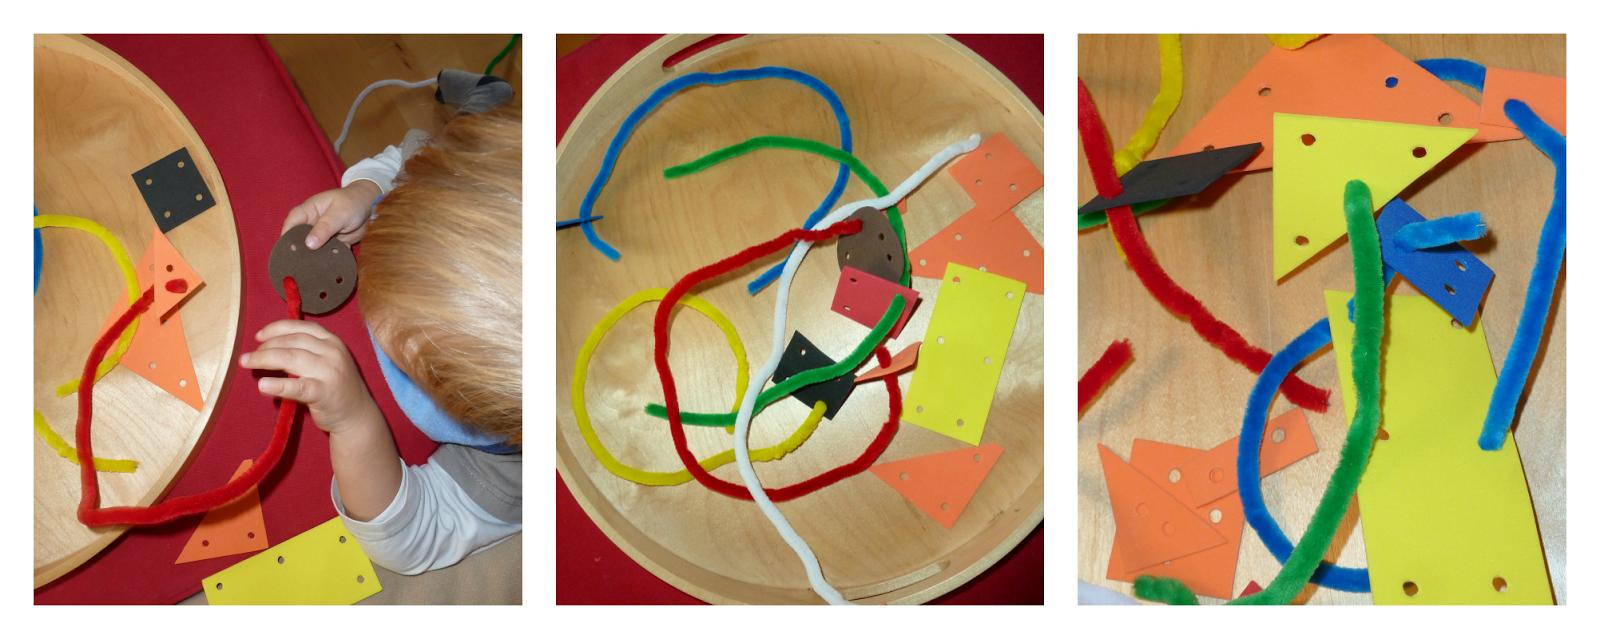 pretikanka - fina motorika za malčke  - penasta guma in kosmate žičke